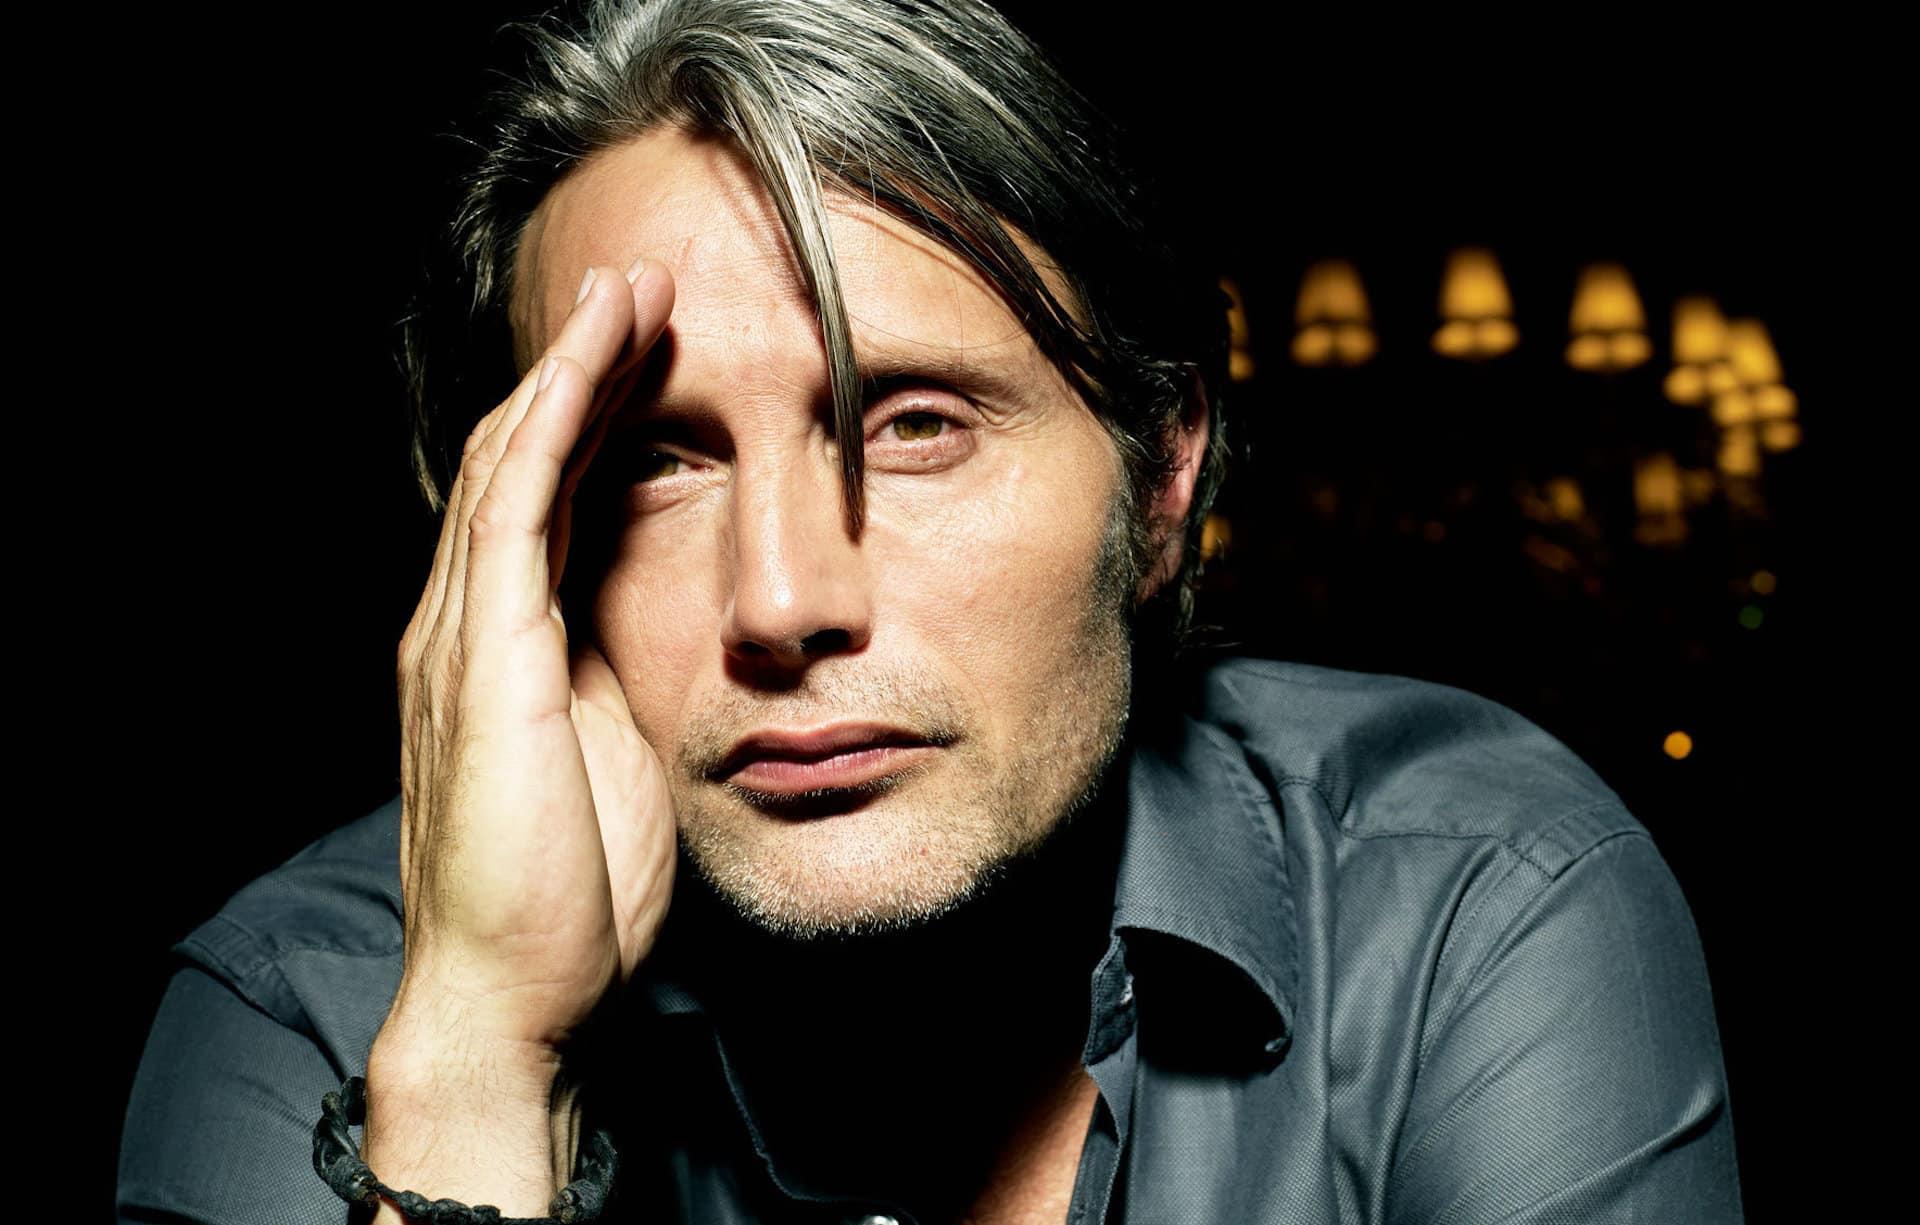 Mads Mikkelsen sostituirà Johnny Depp in Animali Fantastici 3: ecco la conferma